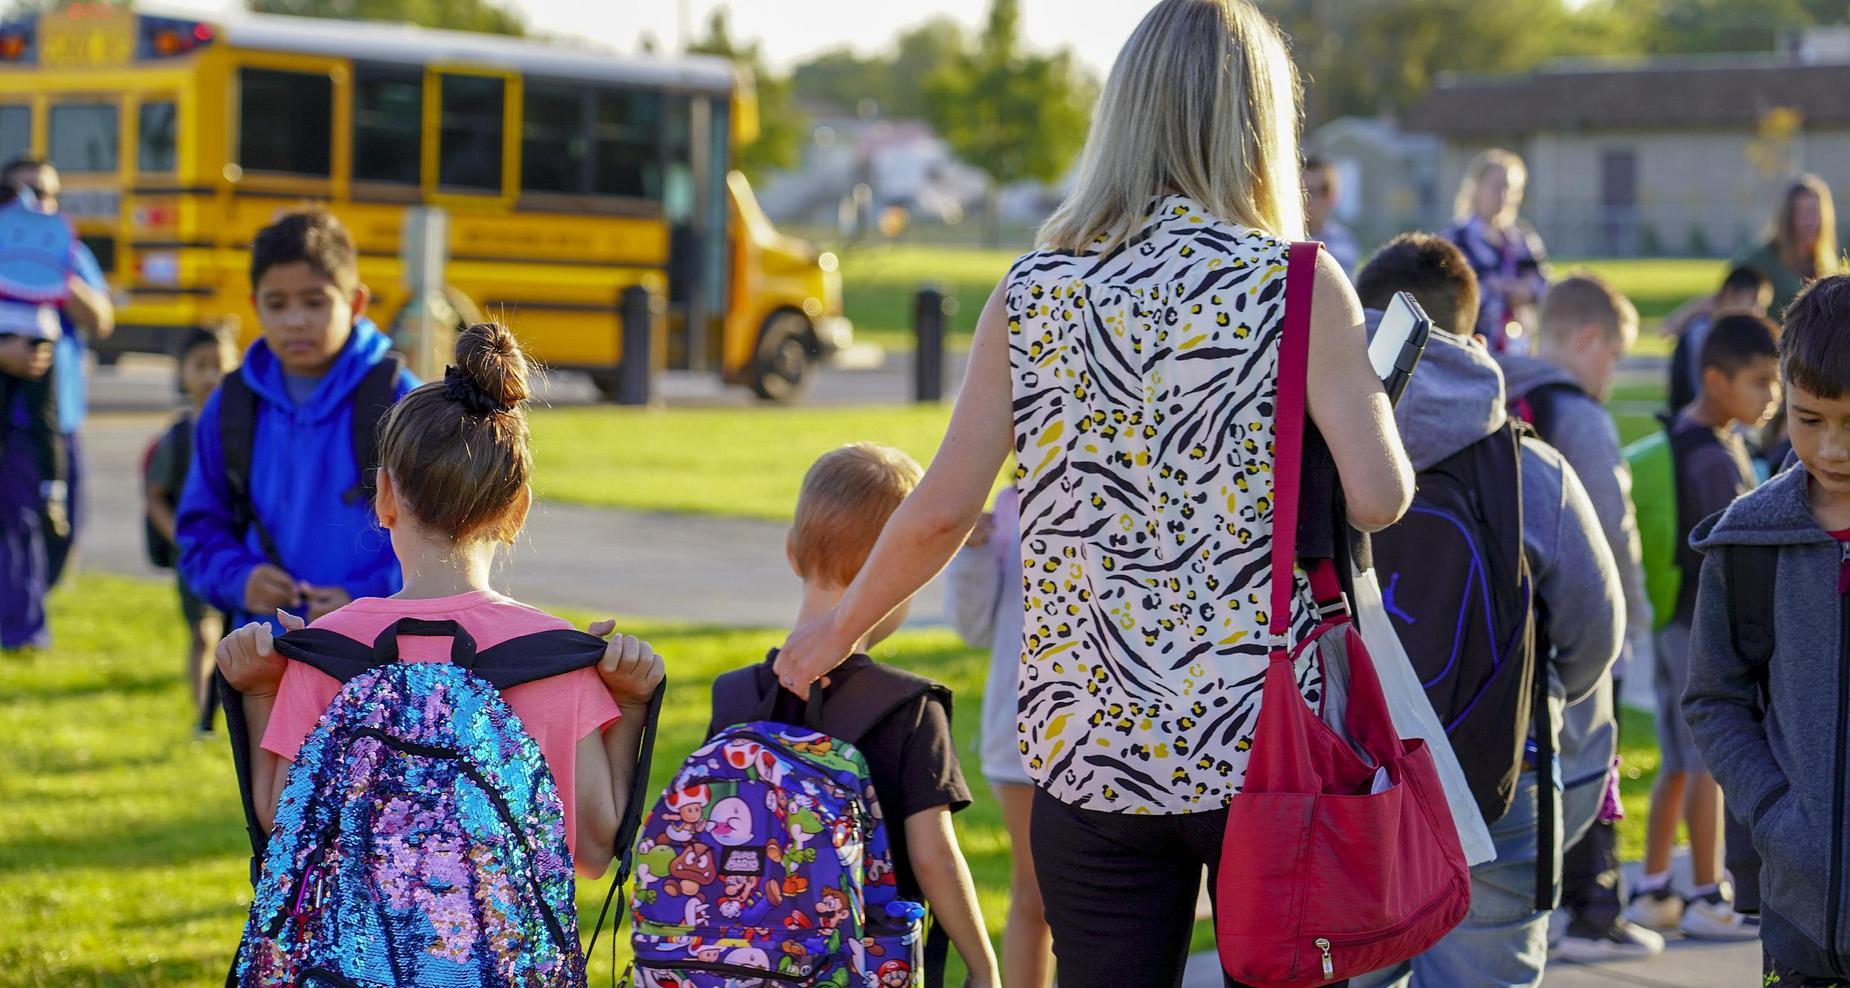 Mom walking child to school.